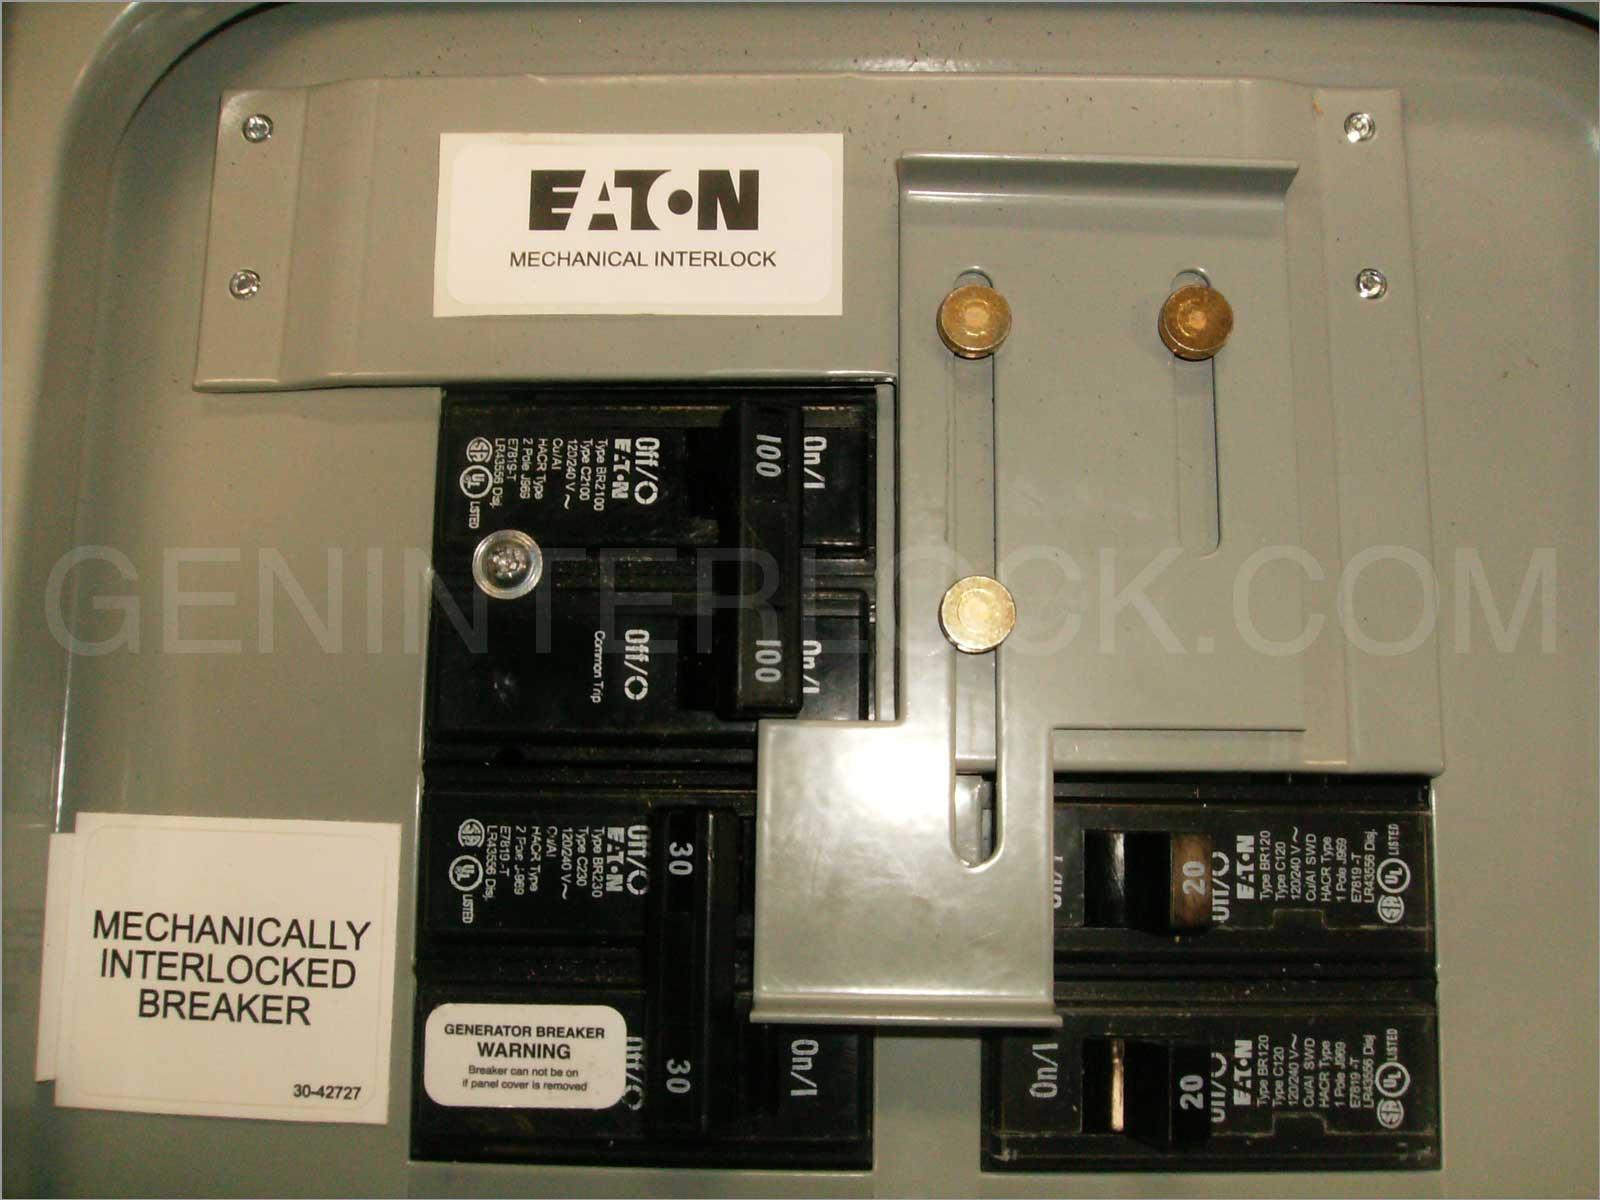 Generator Interlock Installed